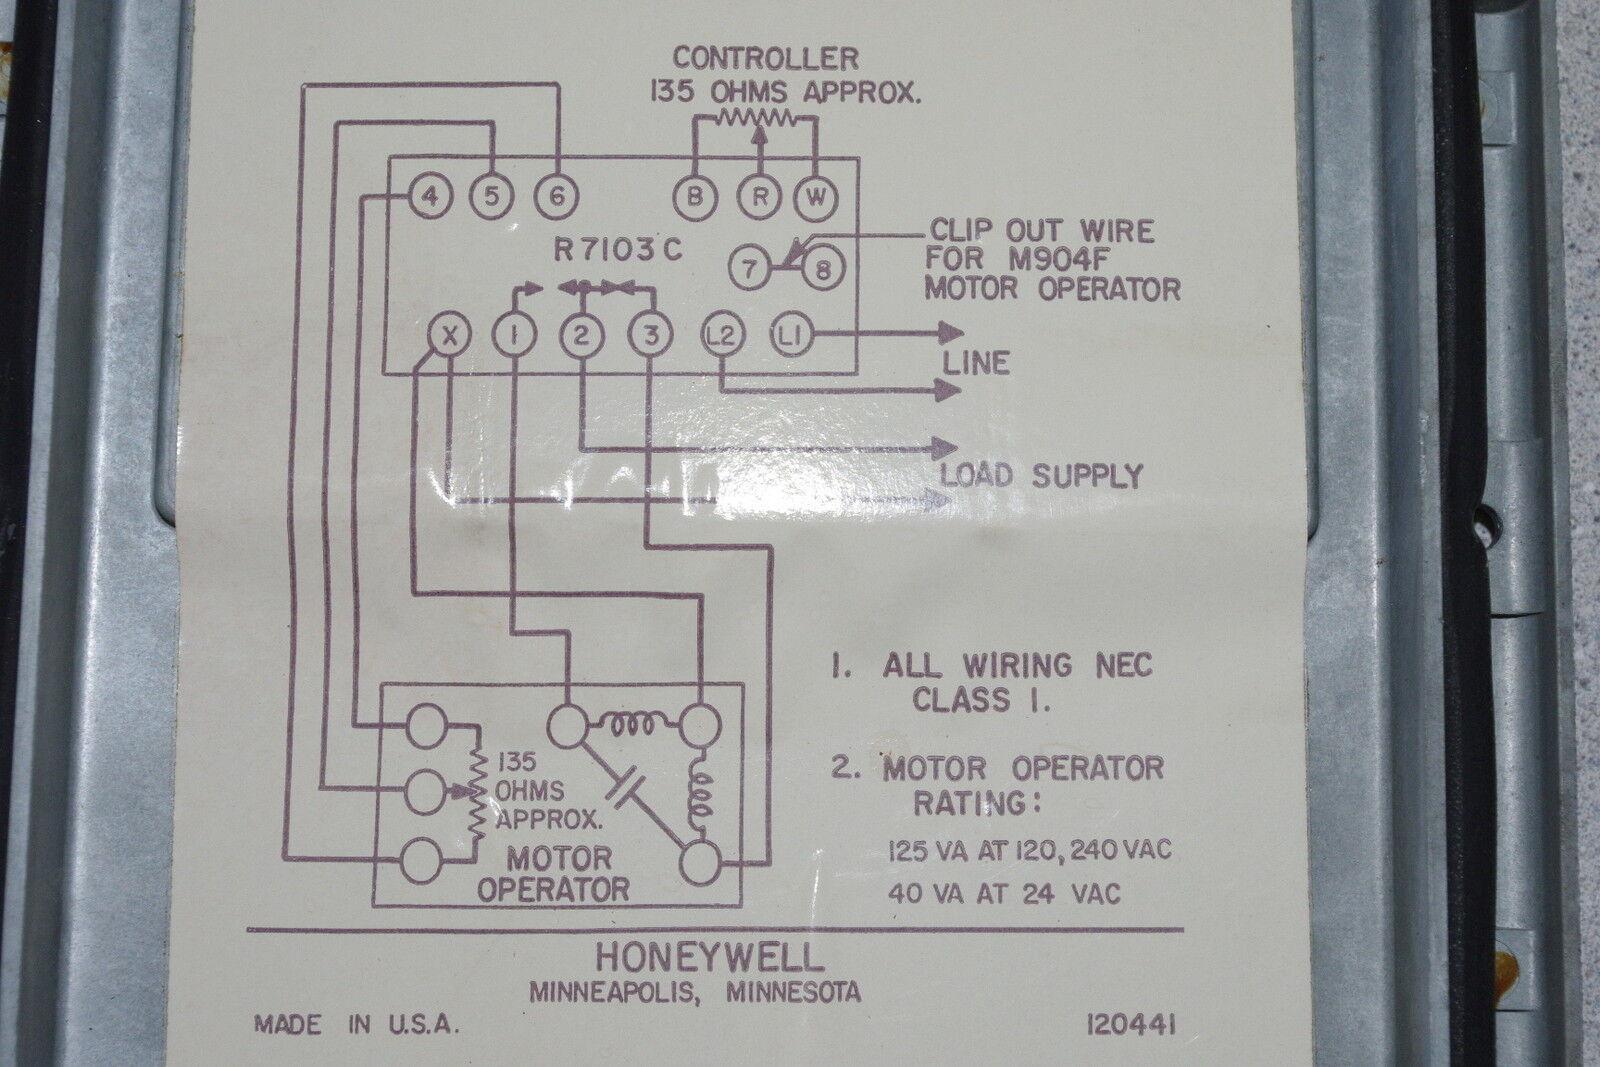 Honeywell 120441 Vintage Controller Ebay 120 240 Motor Wiring Diagram Norton Secured Powered By Verisign